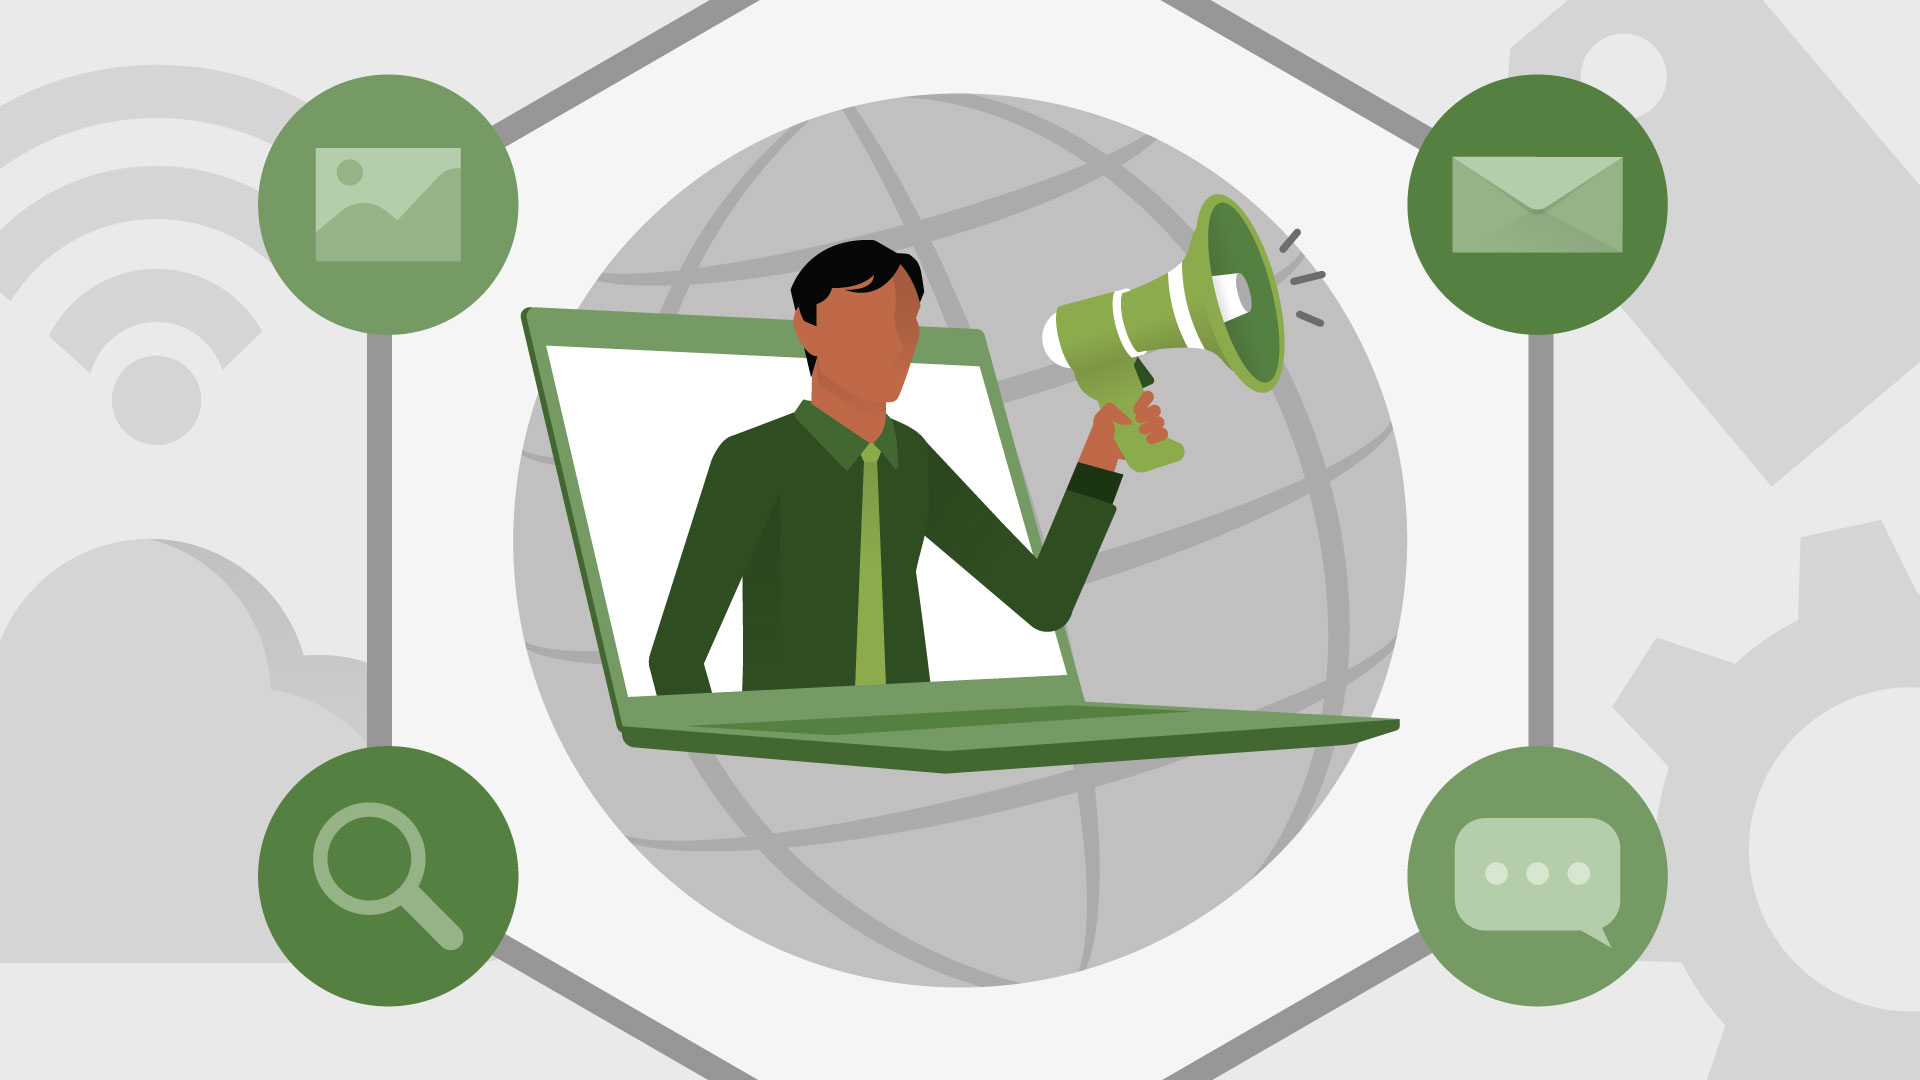 Comprendre L Importance De La Marque Tutoriel Video Gerer La Communication Marketing Integree En Ligne Linkedin Learning Anciennement Lynda Com